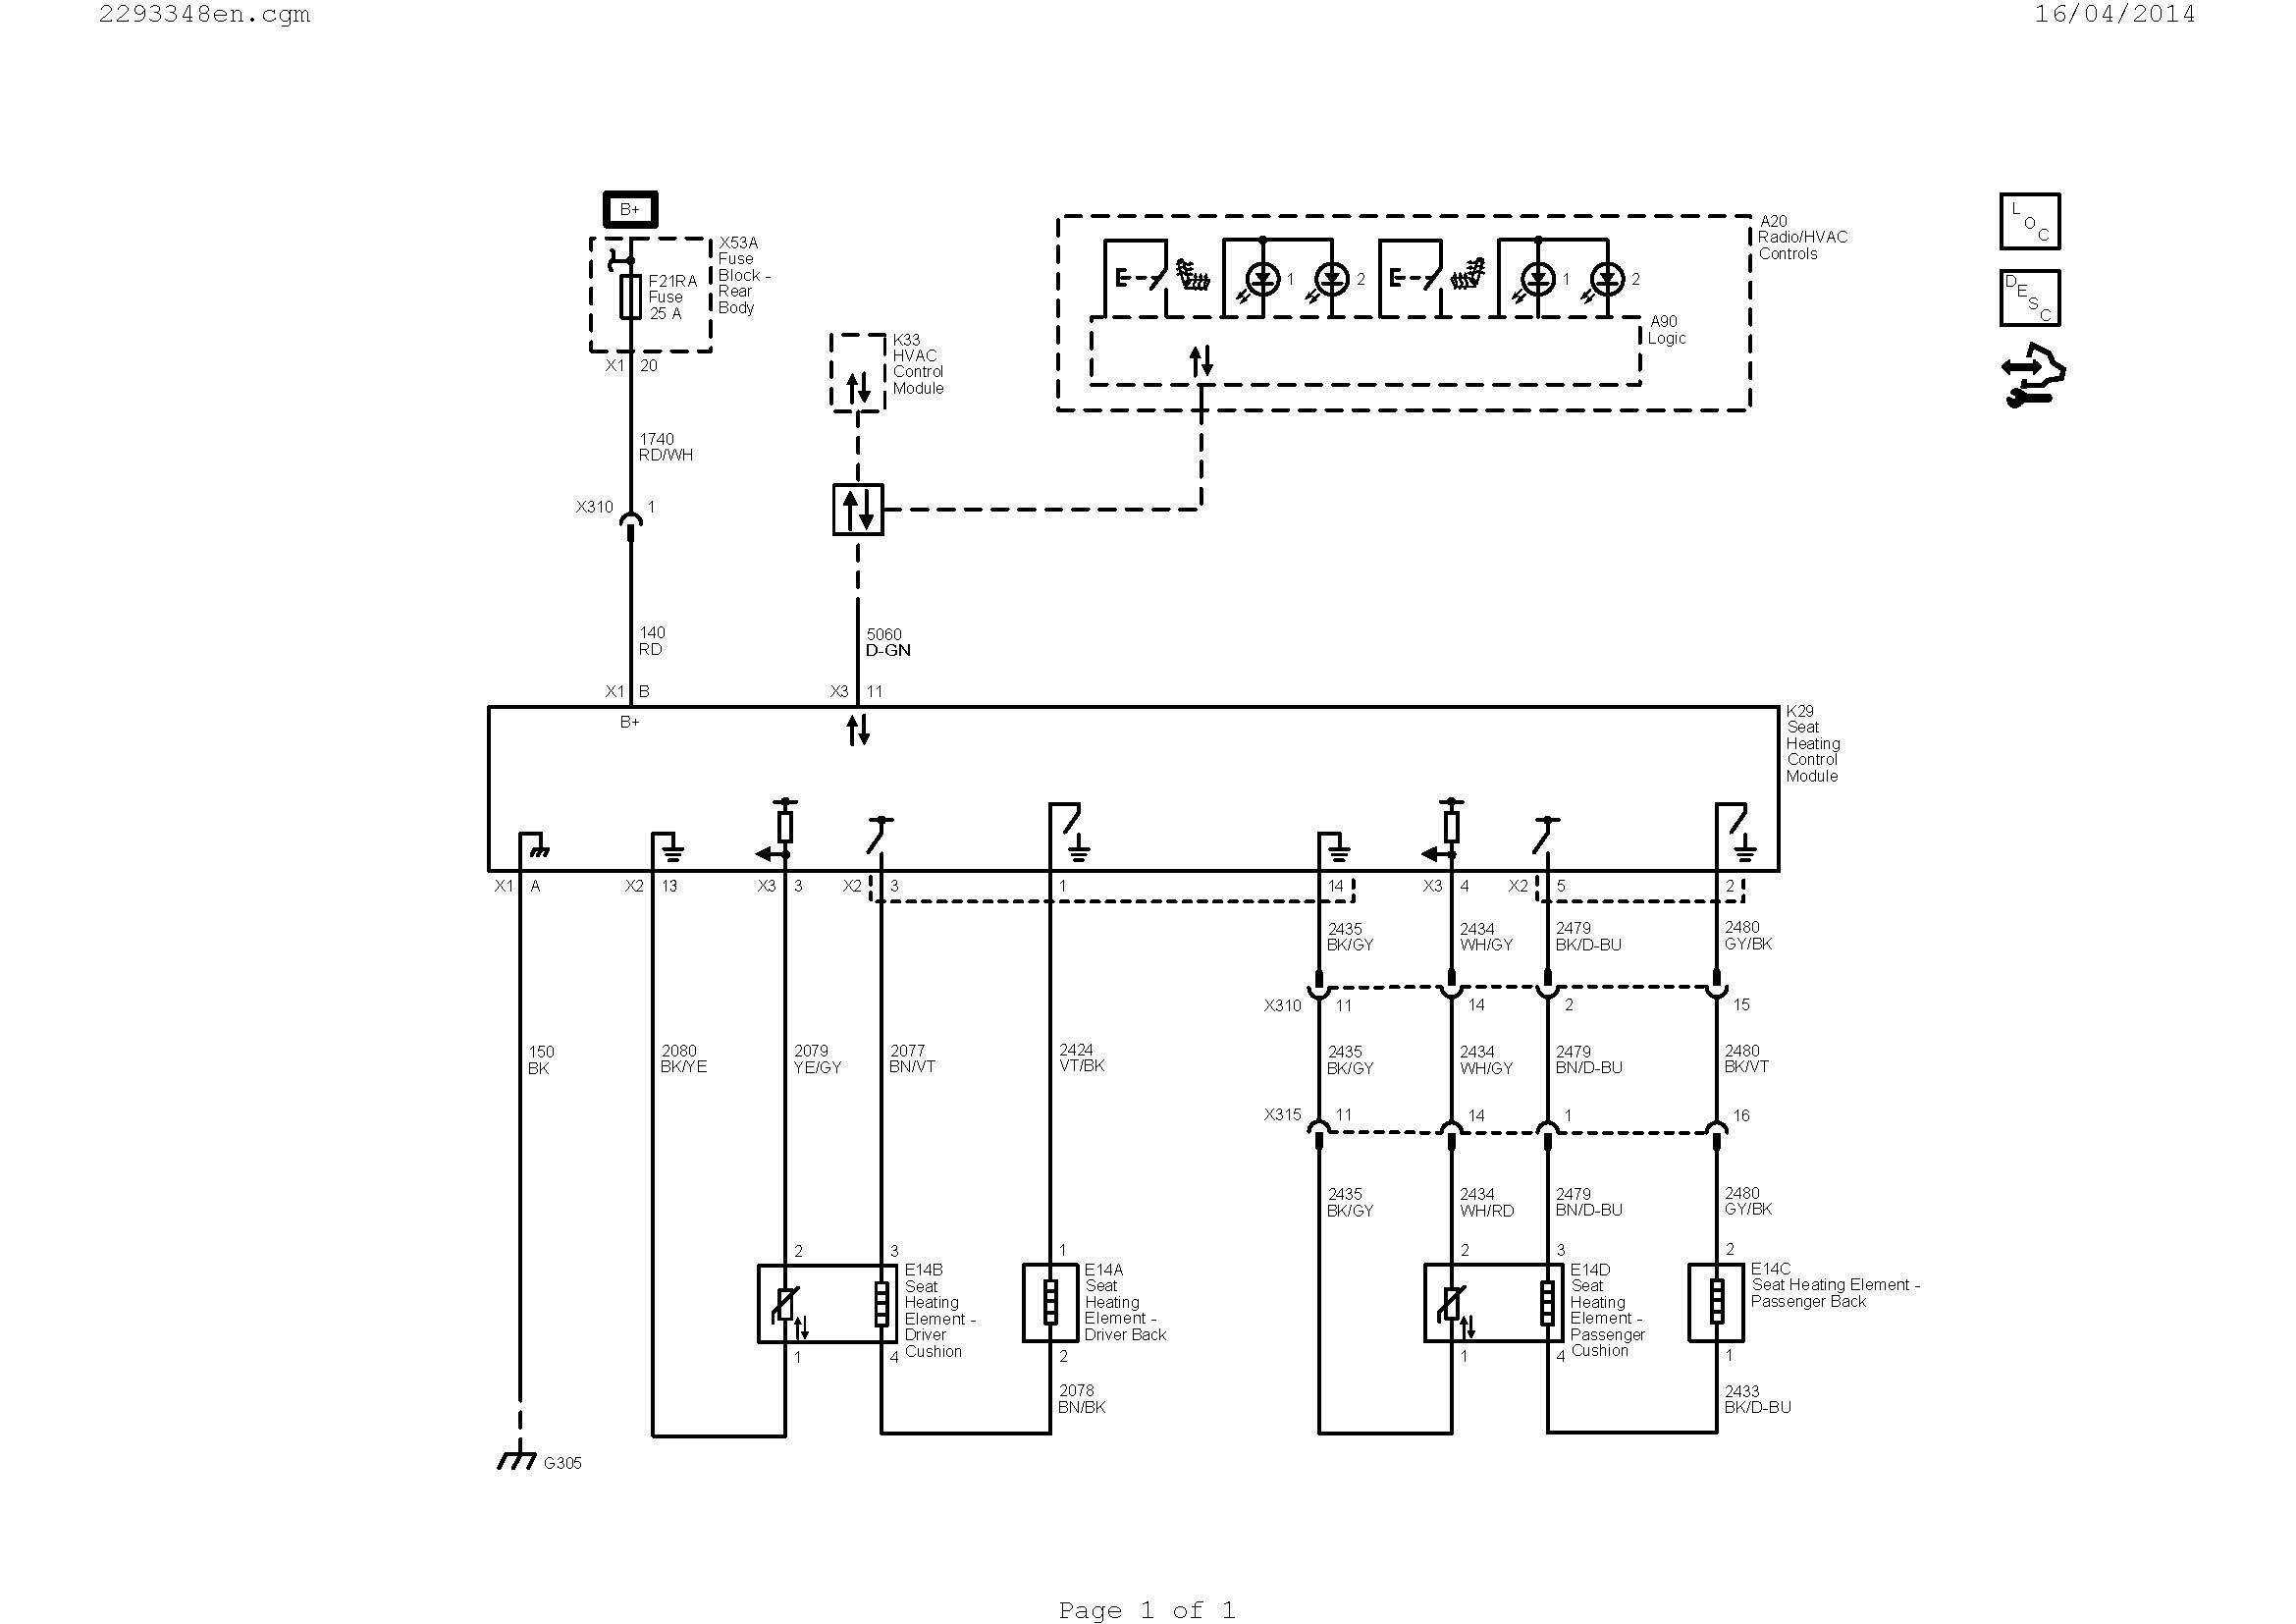 Wiring Diagram Amplifier Save Wiring Diagram Ac Valid Hvac Diagram Best Hvac Diagram 0d –